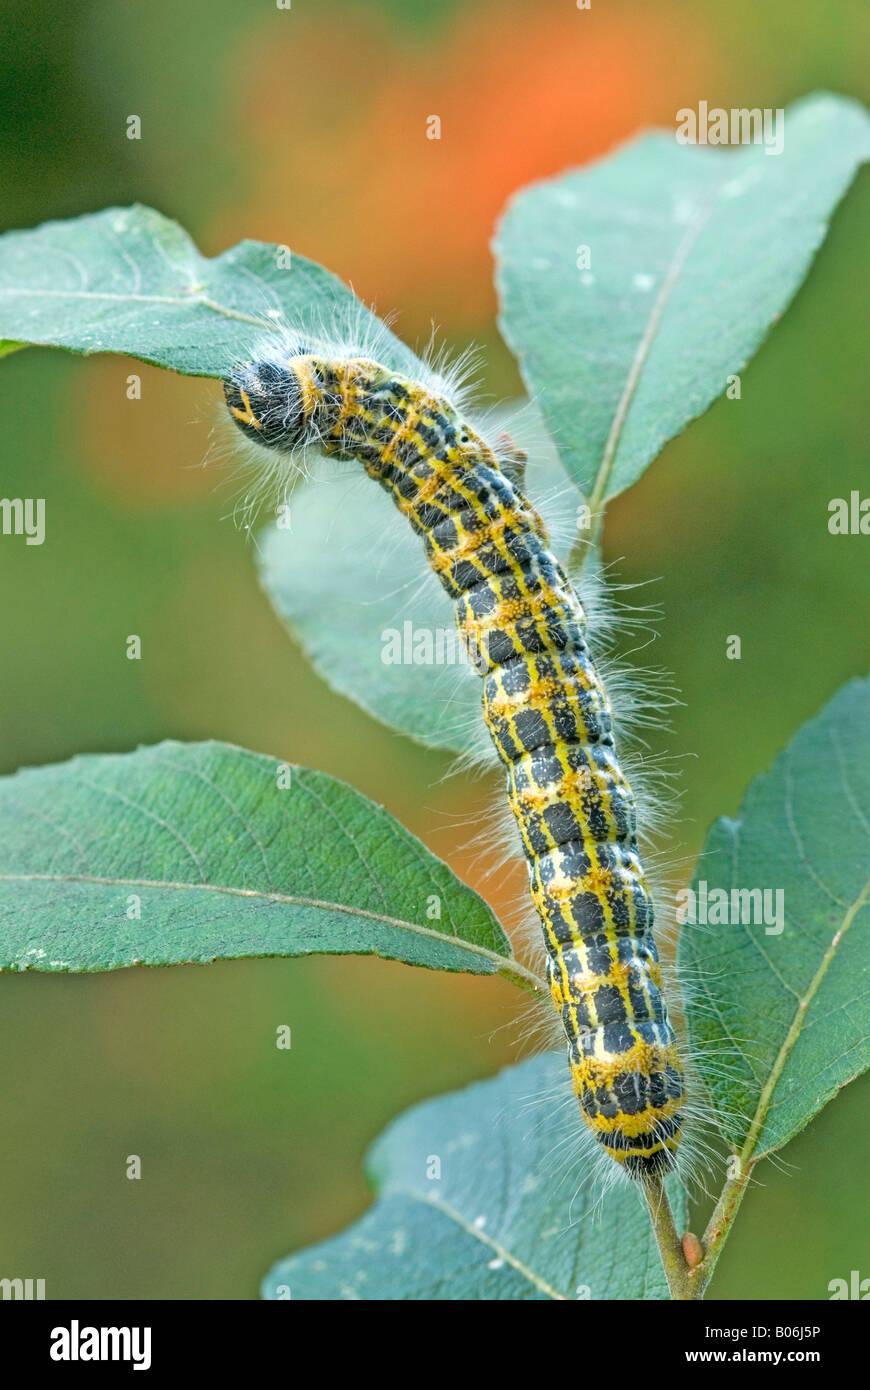 Buff-tip Moth (Phalera bucephala), caterpillar eating leaf - Stock Image